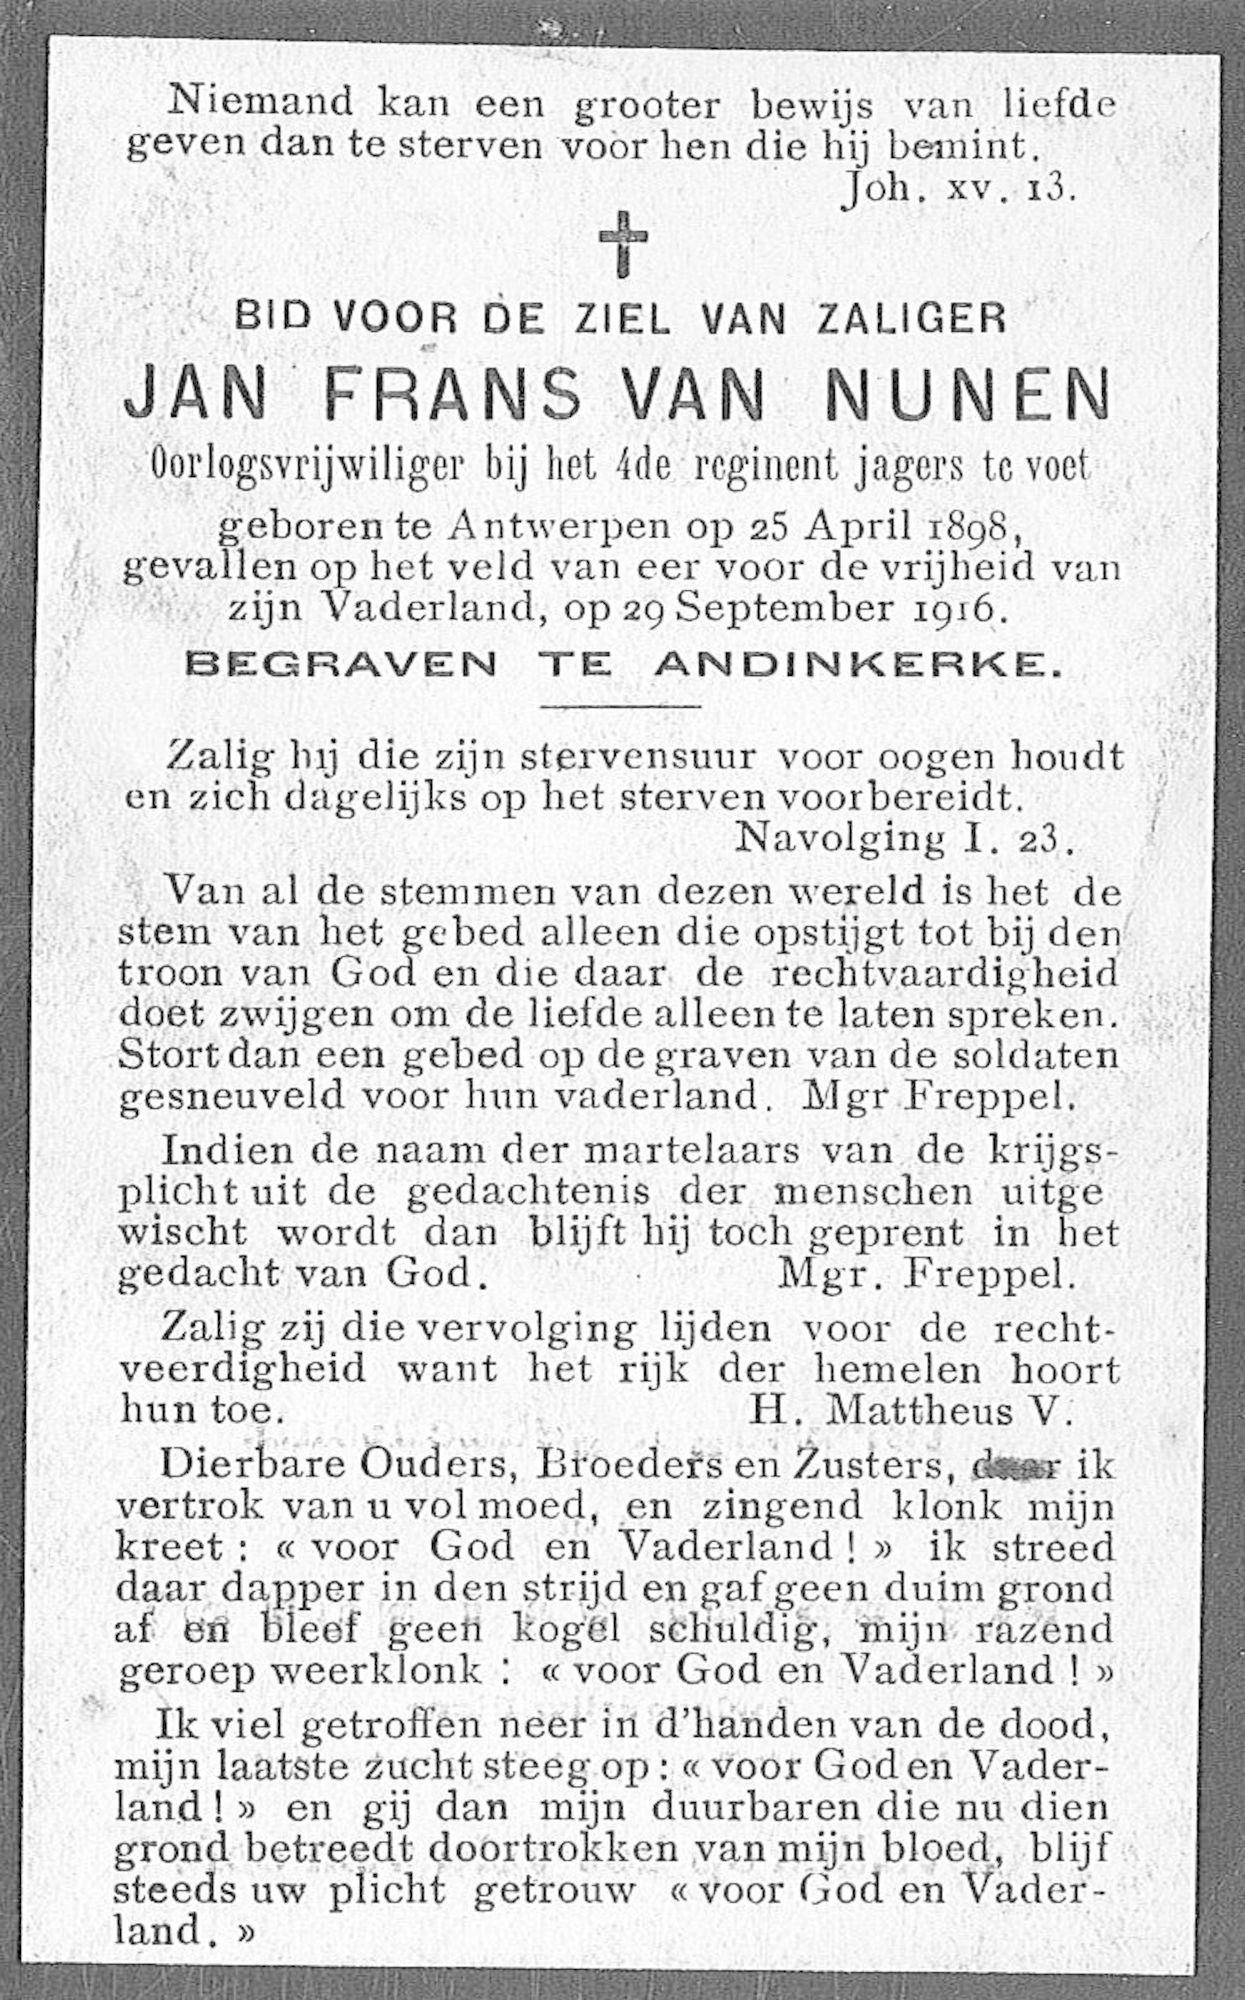 Jan Frans Van Nunen